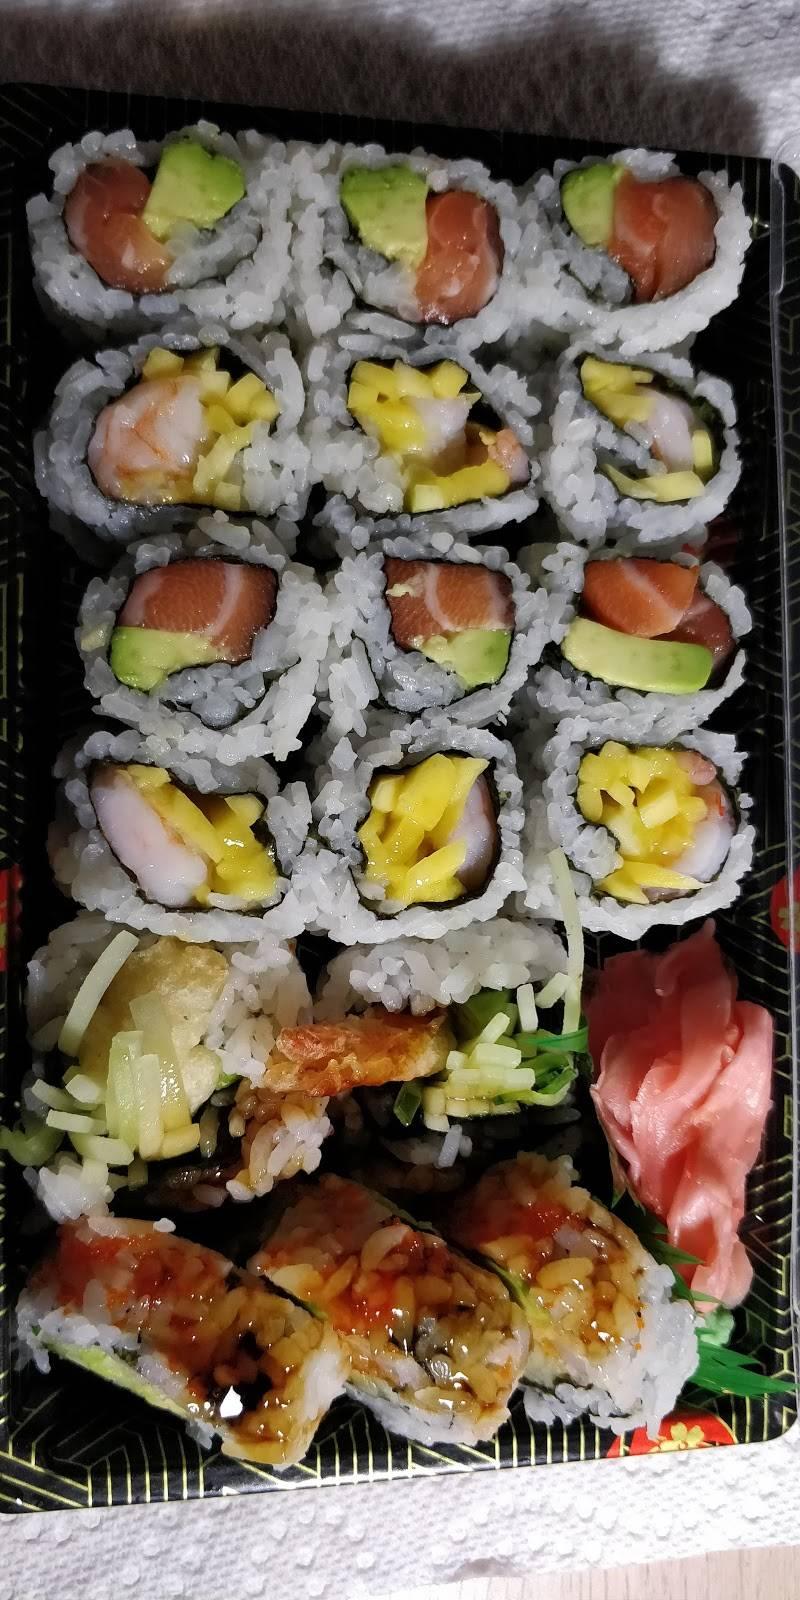 Sakura Tokyo | restaurant | 604 Nostrand Ave, Brooklyn, NY 11216, USA | 7187568787 OR +1 718-756-8787